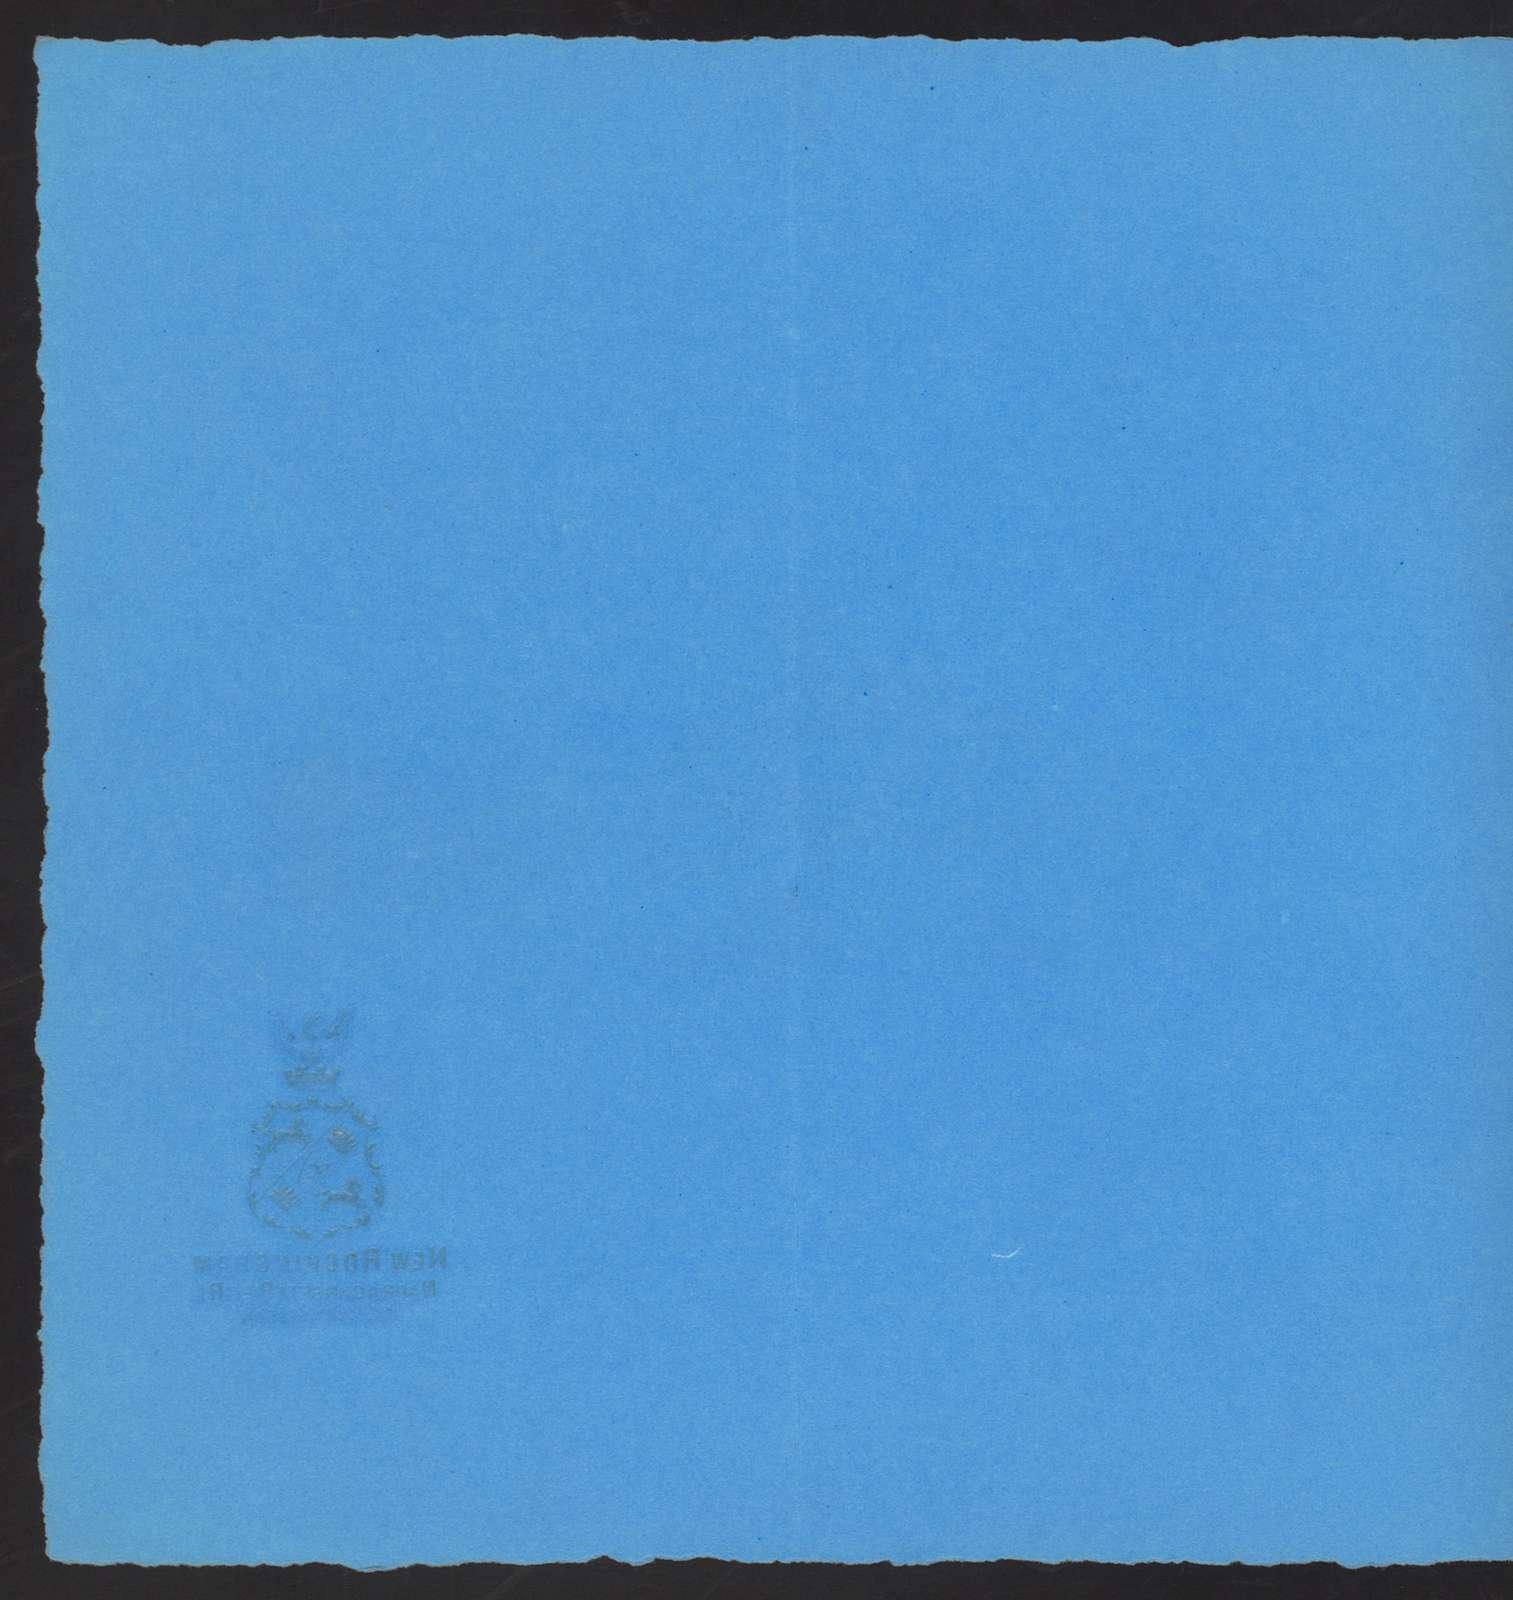 "FOURTH OF JULY MENU [held by] NEW ROCKINGHAM [at] ""NARRAGANSETT PIER, RI"" (HOTEL;)"